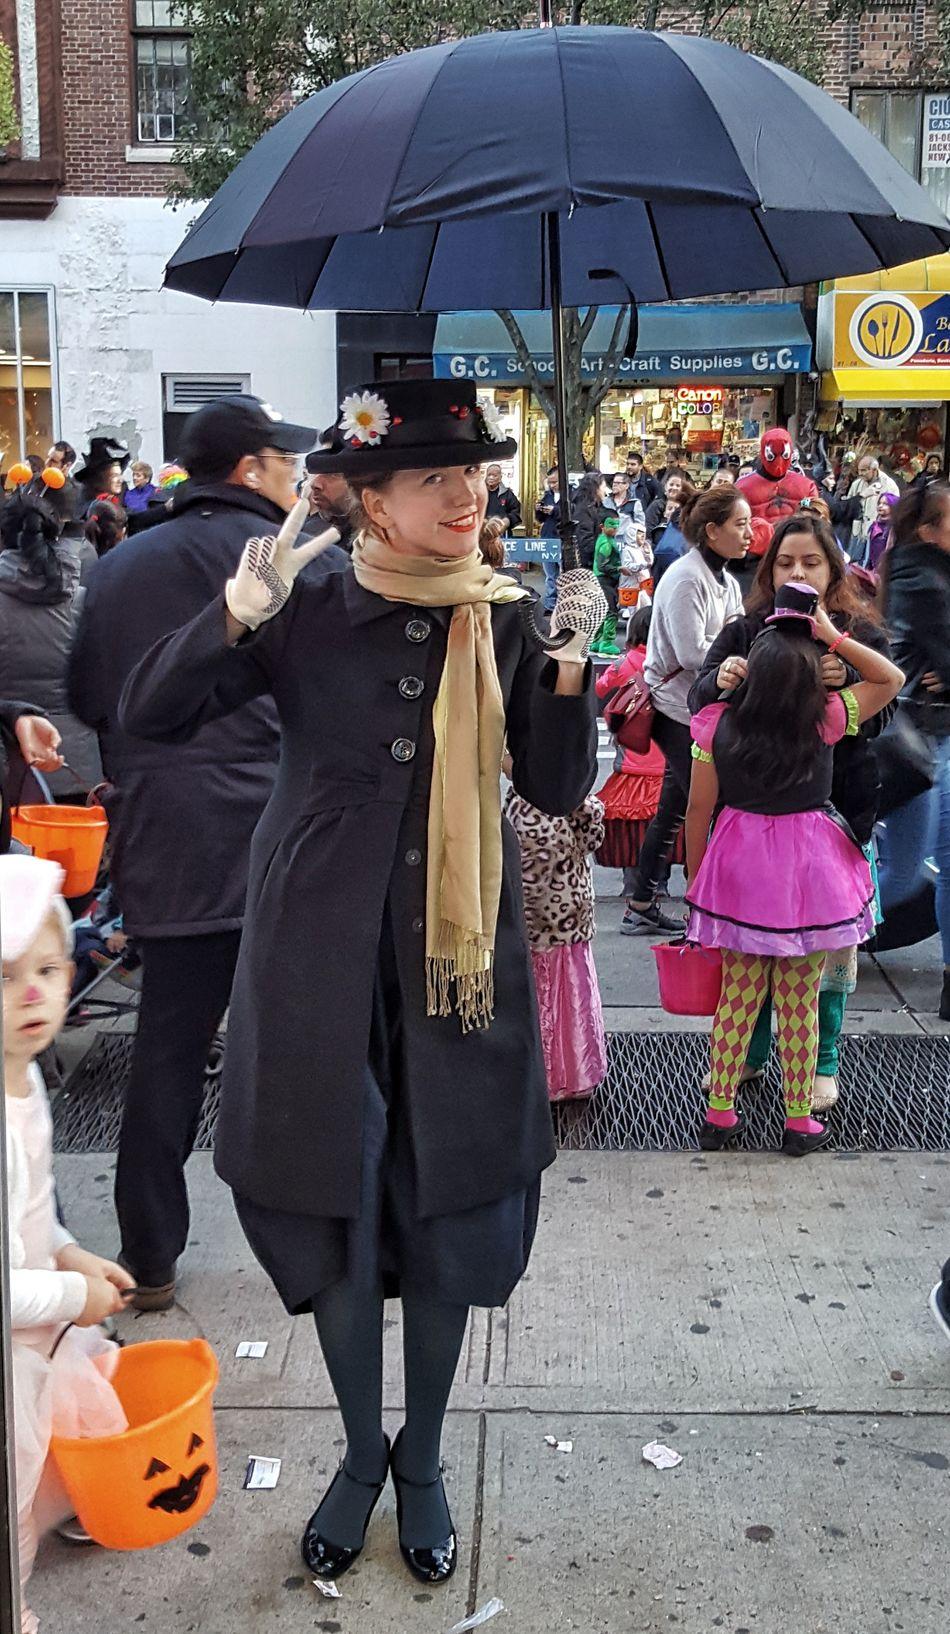 Mary Poppins Marypoppins Halloween_Collection Halloween2016 Halloween EyeEm